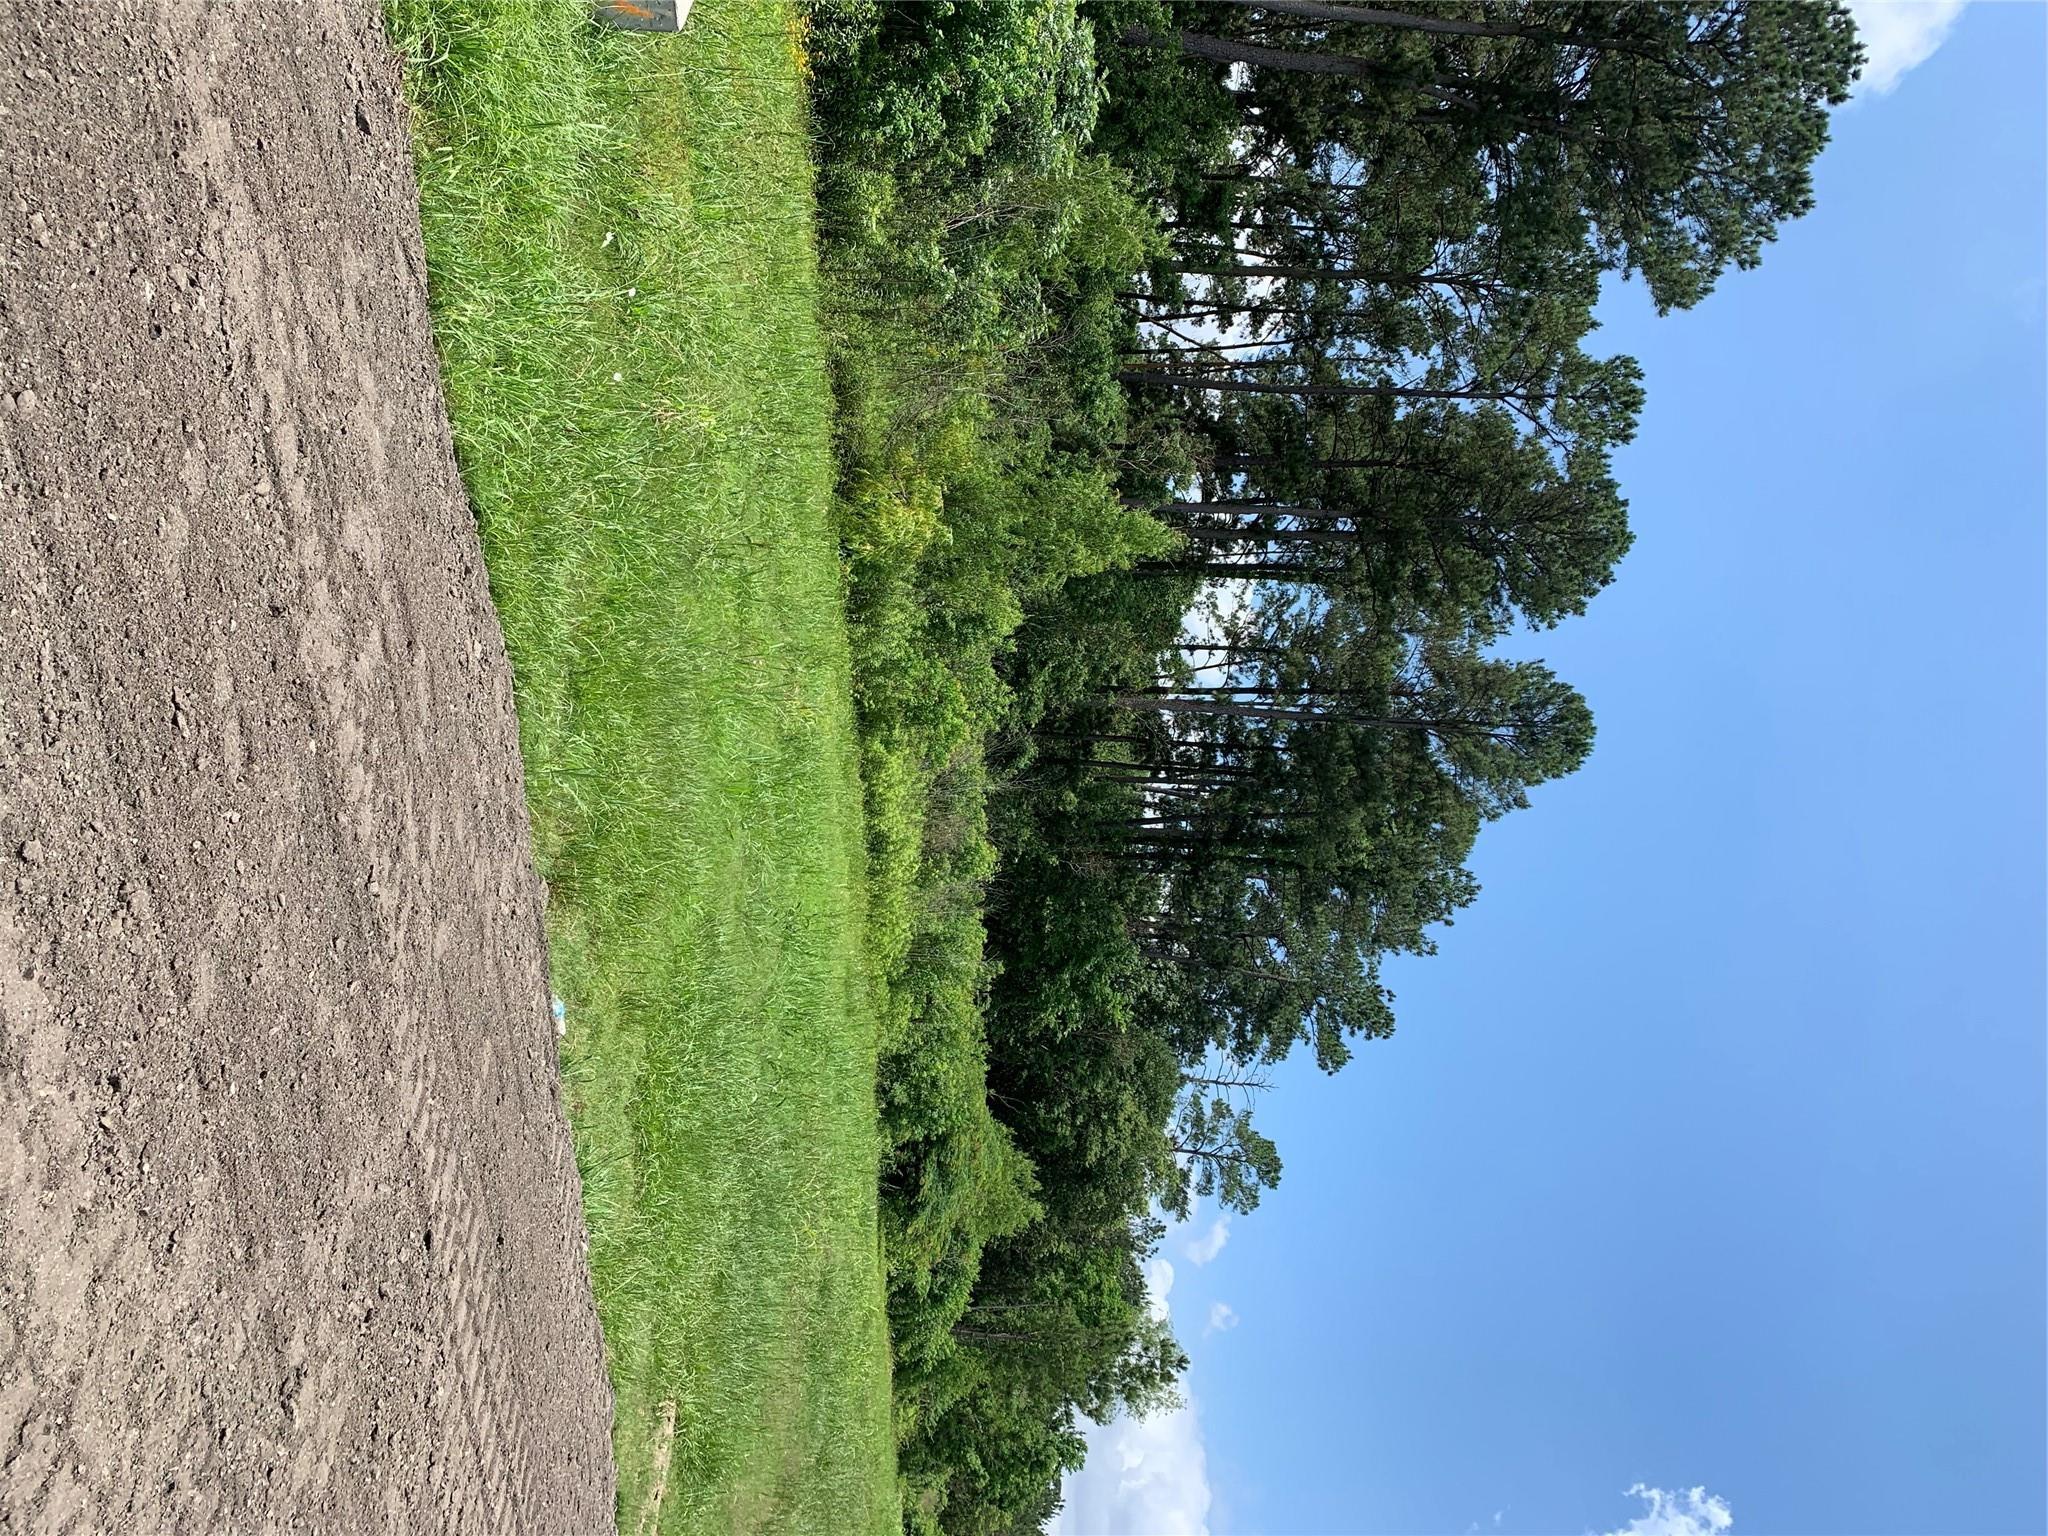 Tbd 13.7 Acres Fm 2100 Road Property Photo